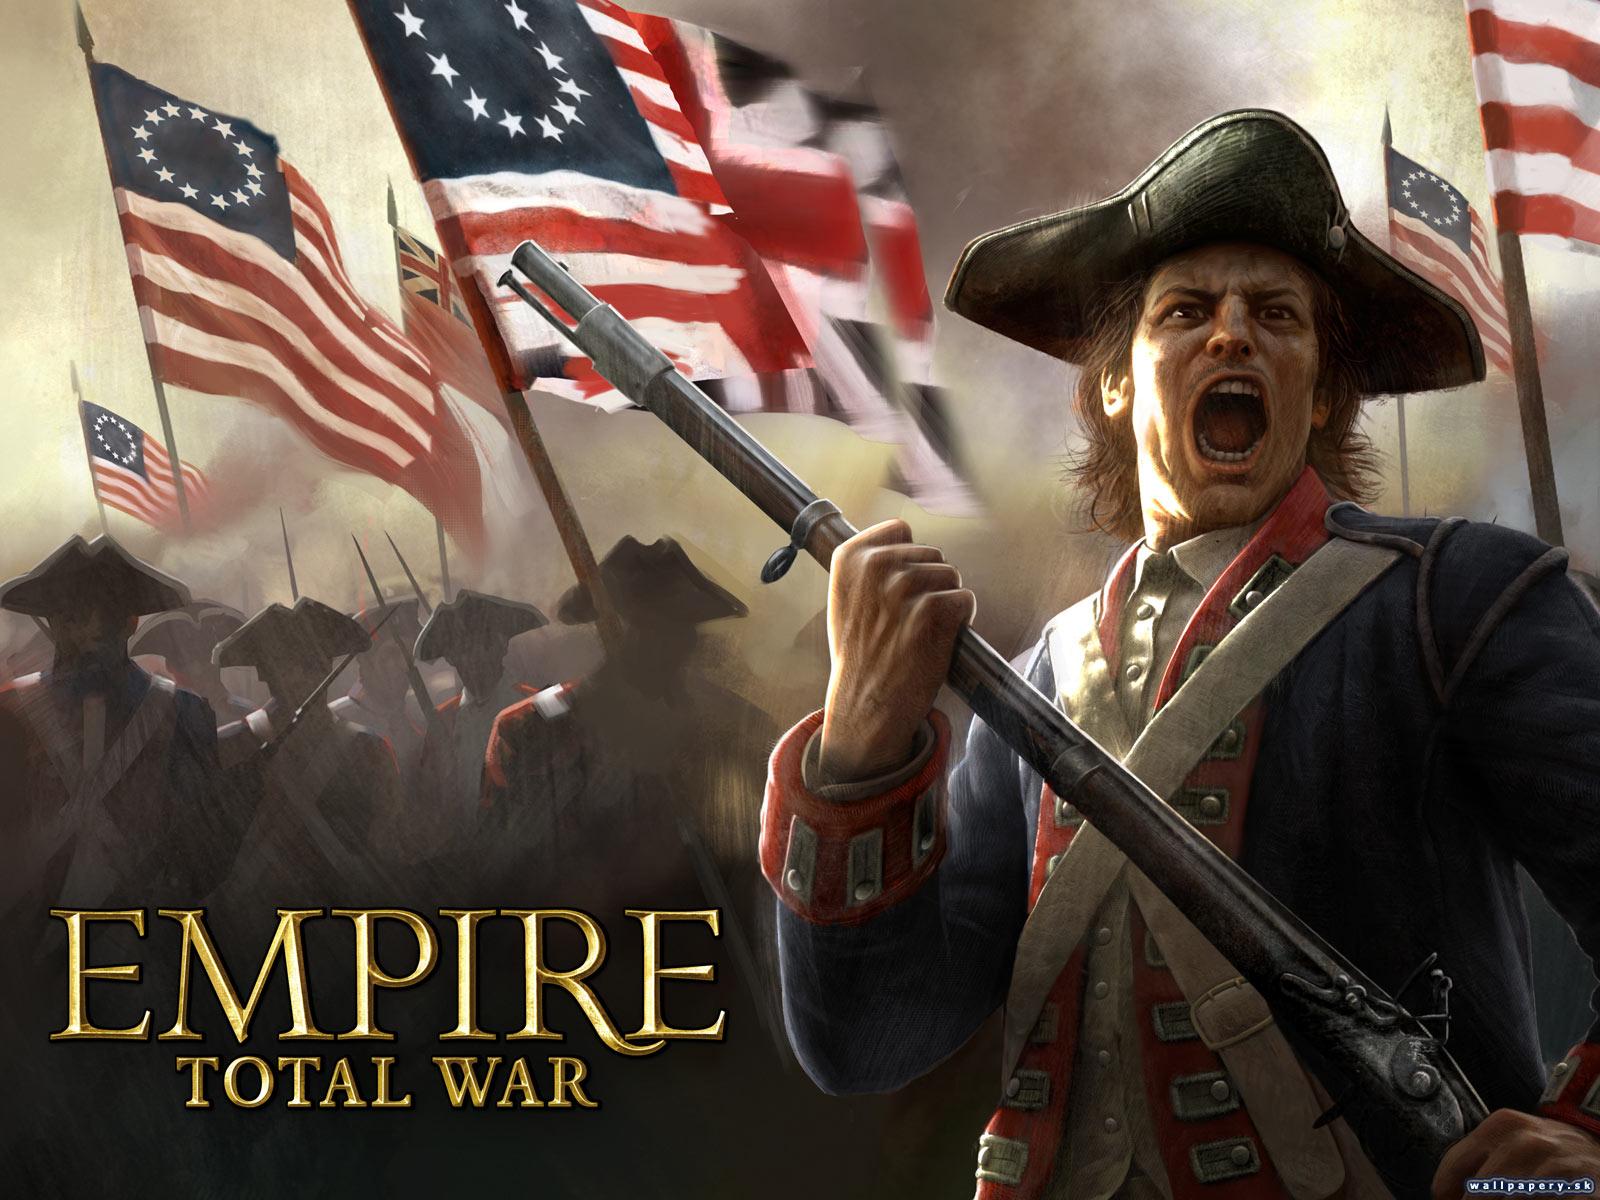 Empire Total War   wallpaper 6 ABCgamescz 1600x1200